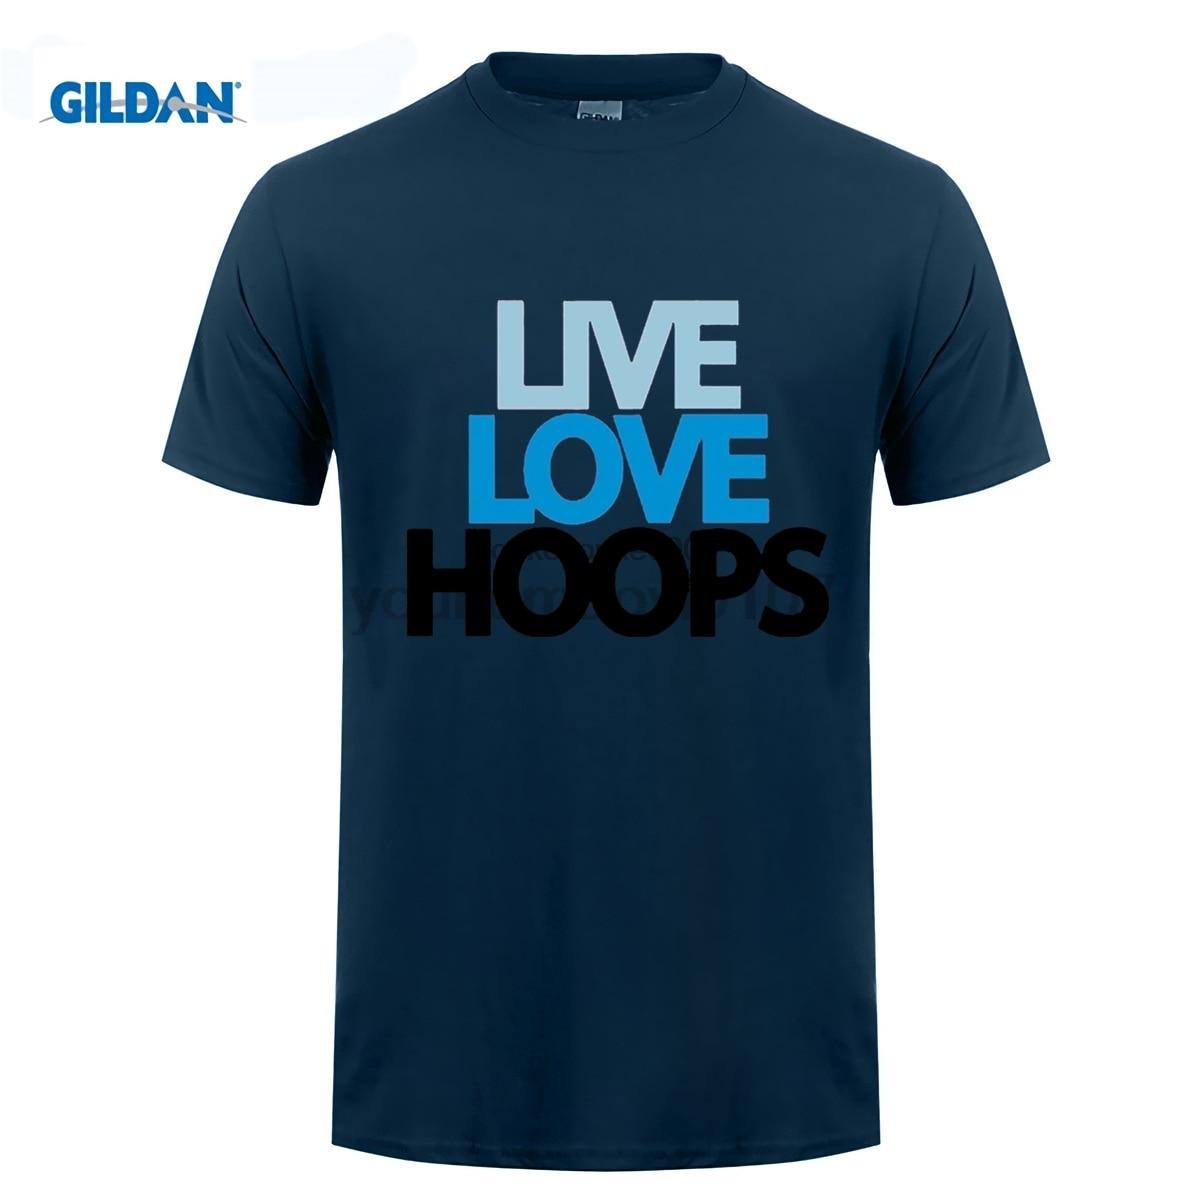 GILDAN funny men t shirt Live Love Hoops Guy T shirt For Sale Large Size Basketballer Team Men Print T Shirt